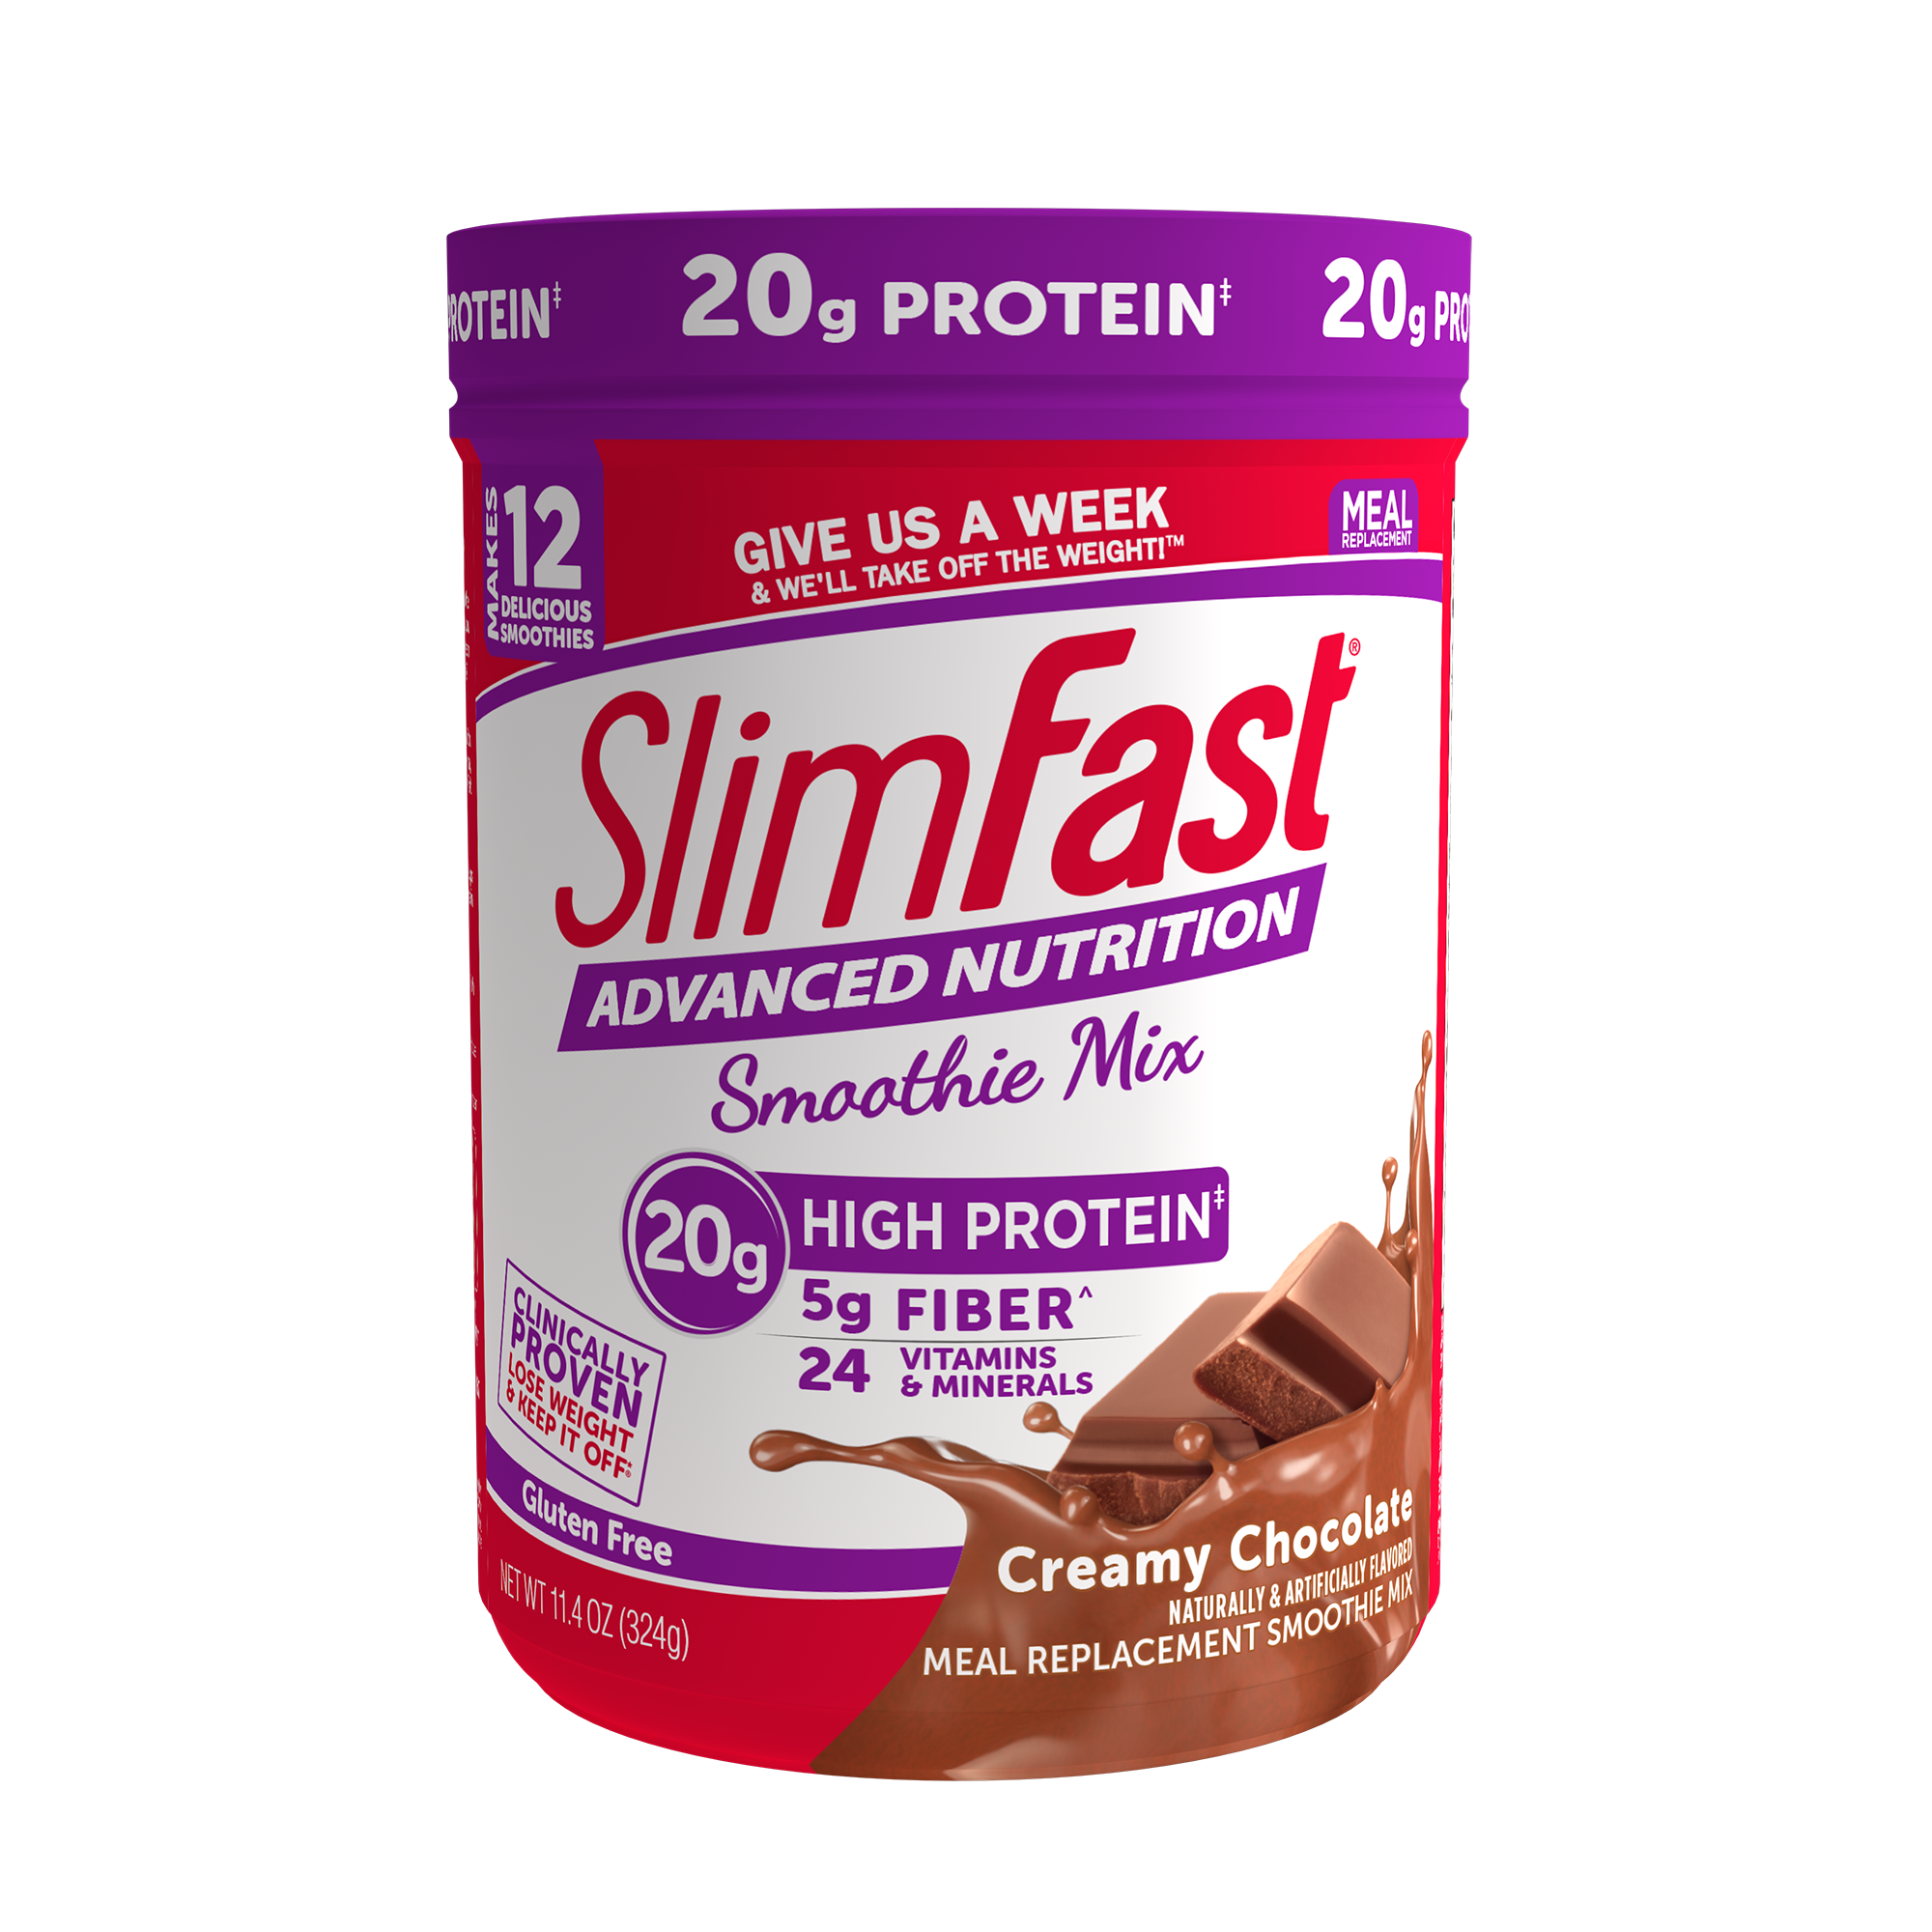 SlimFast Advanced Nutrition Smoothie